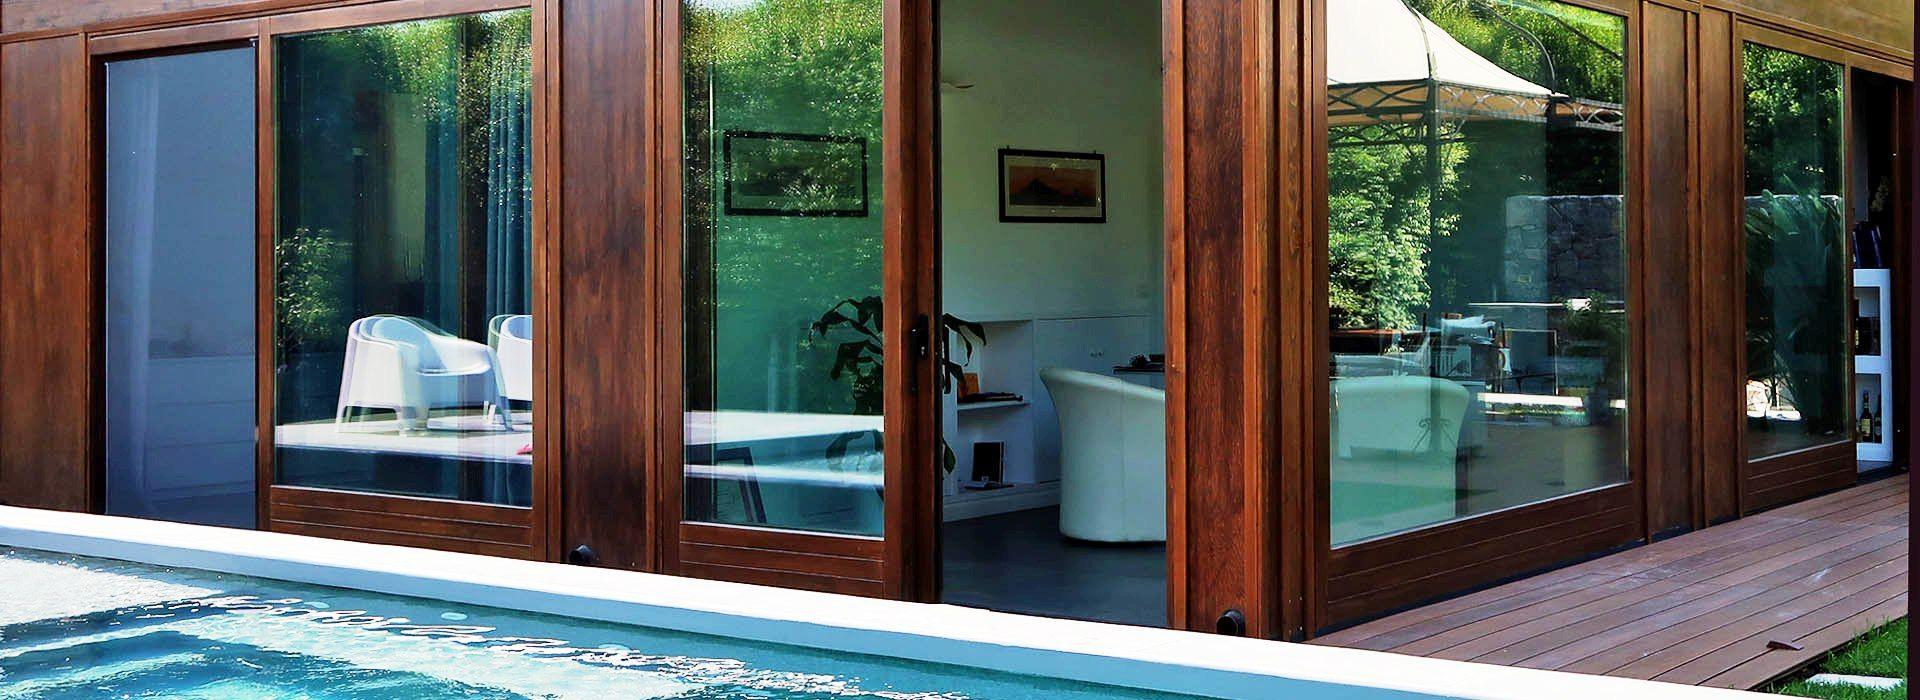 online shop arredi da giardino | arredamento da esterno design ...